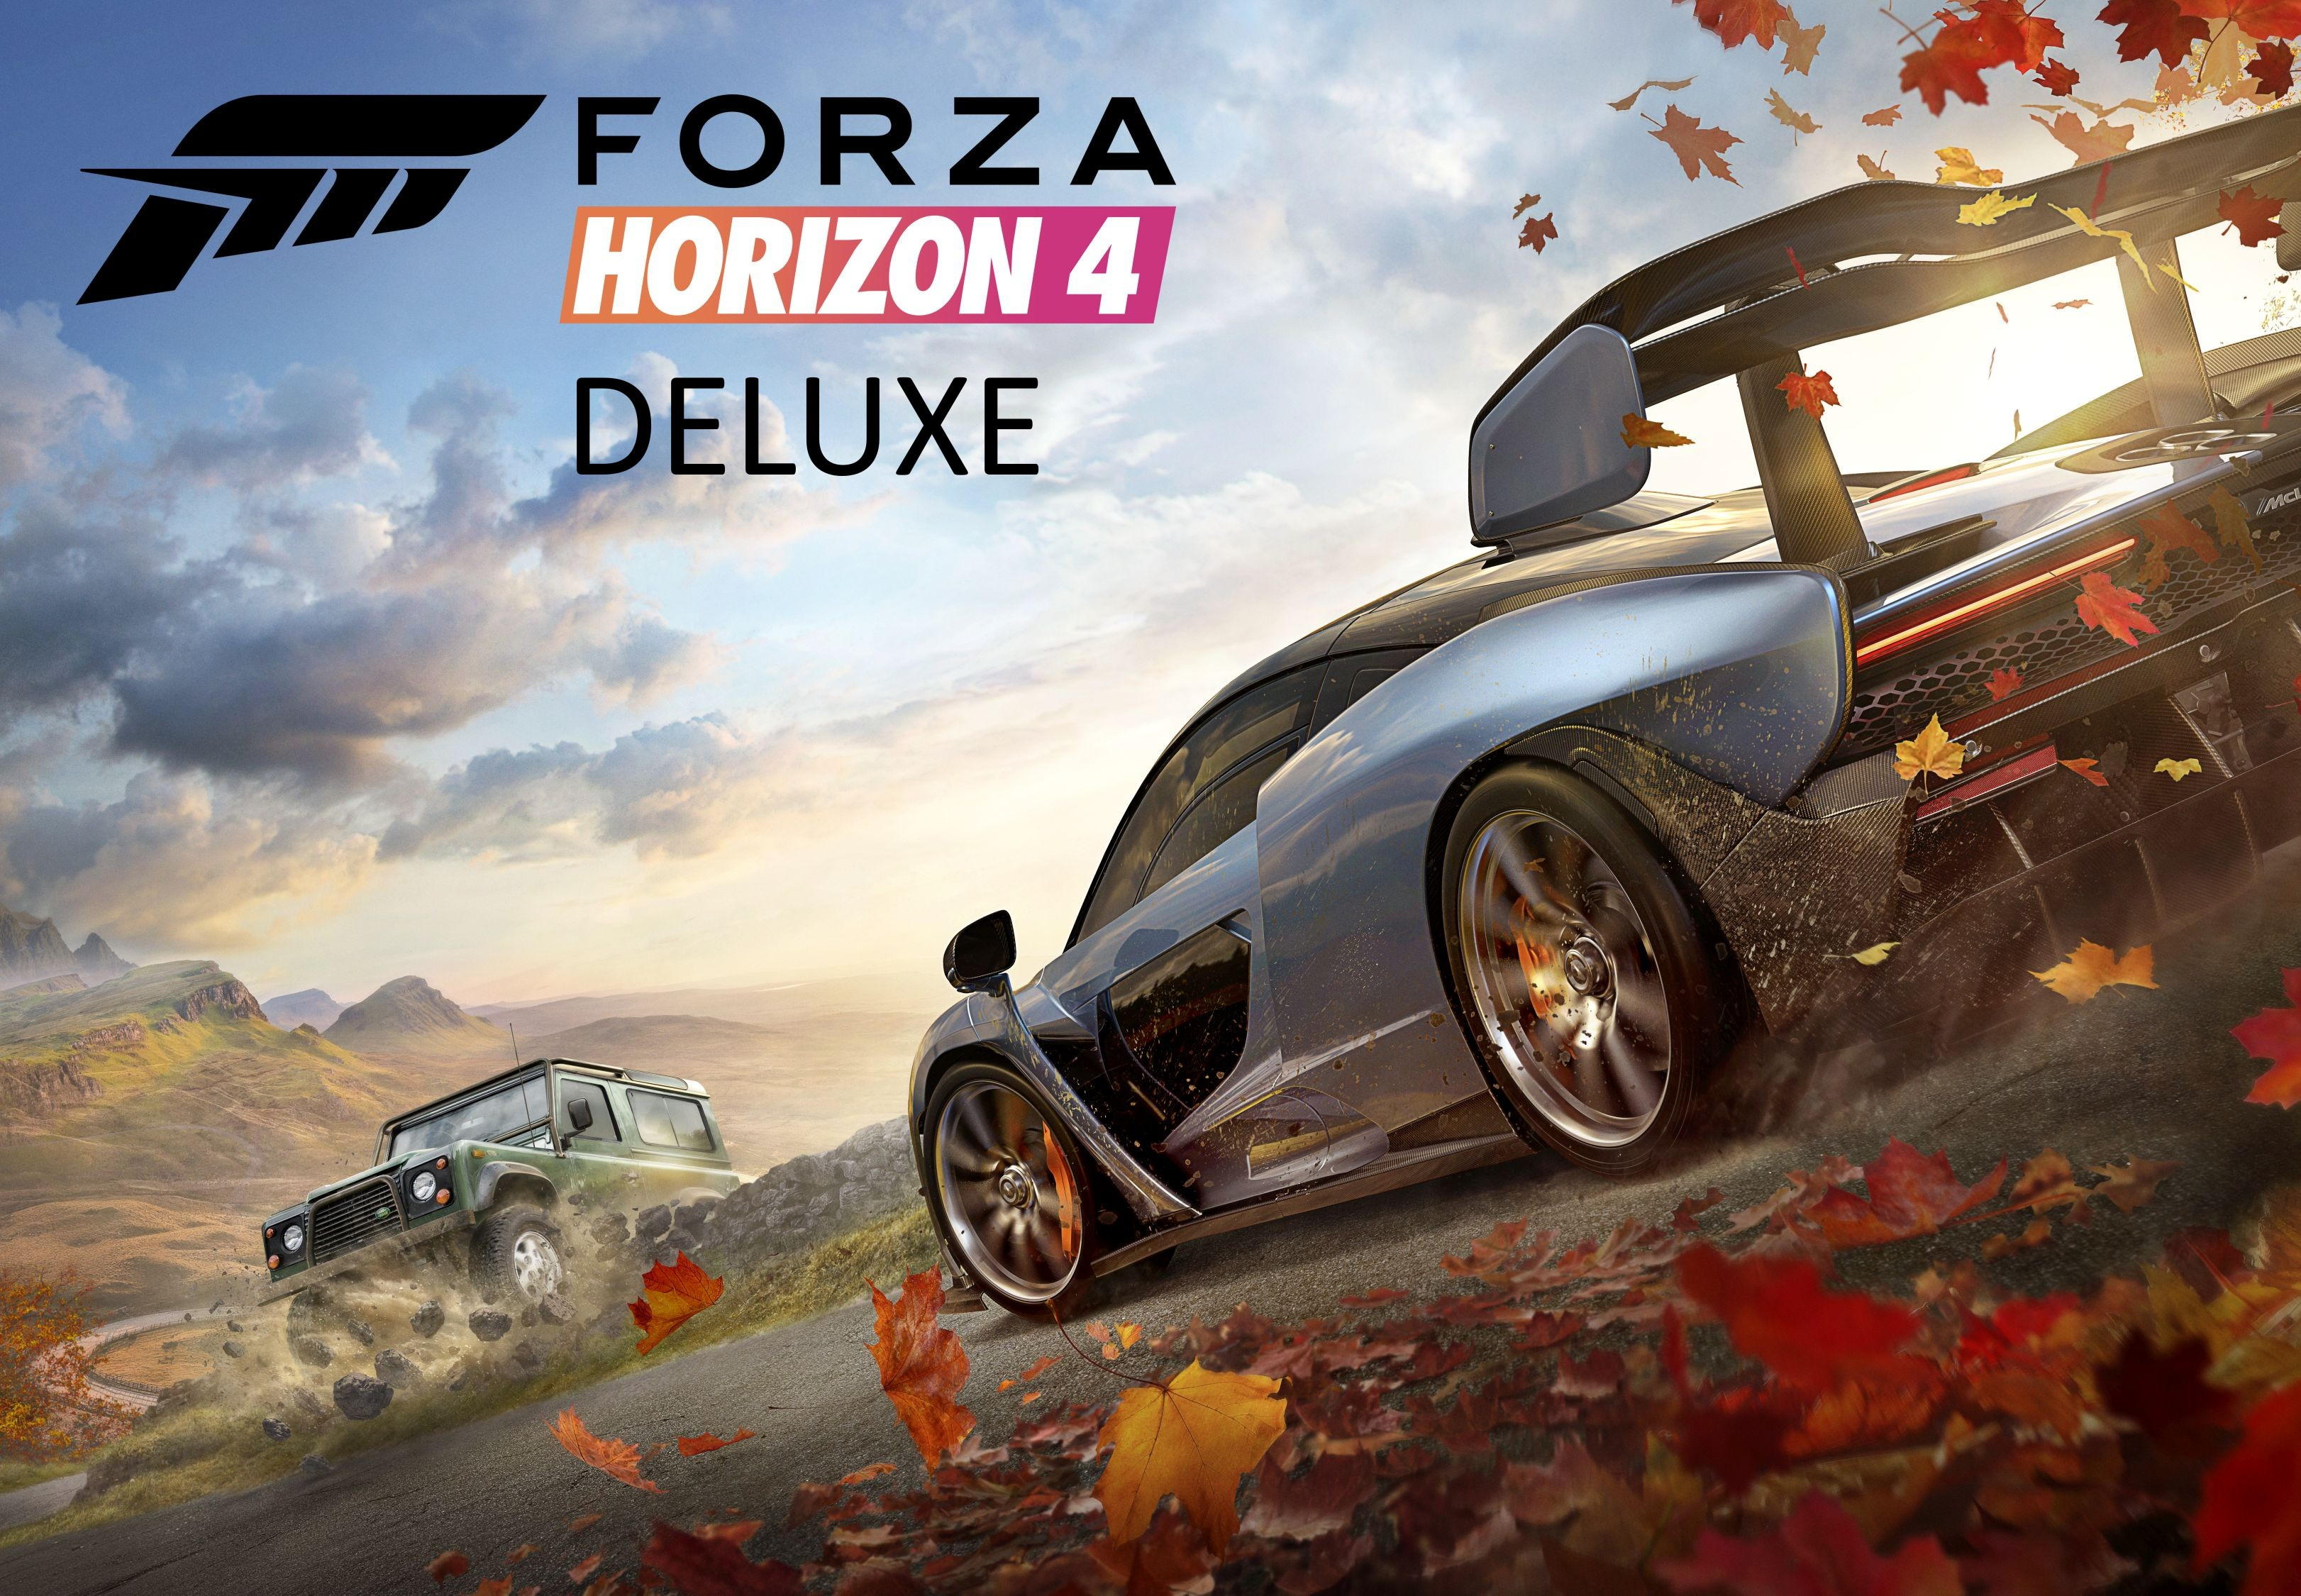 Forza Horizon 4 Deluxe Edition US XBOX One / Windows 10 CD Key